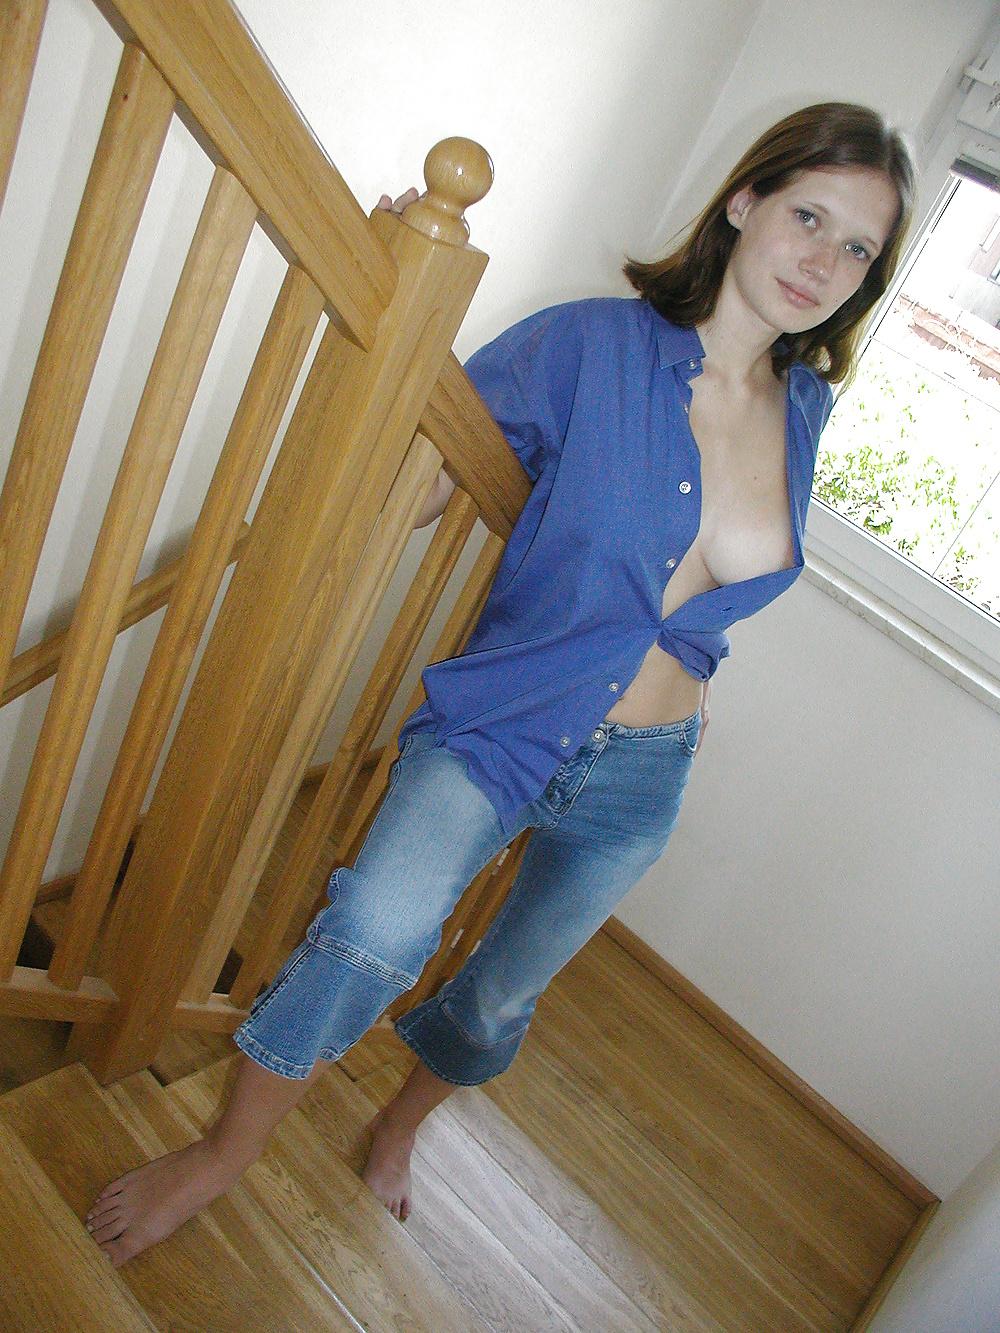 Anonym Fremdgehen - likegirl.de Partnersuche Fremdgehen Dating